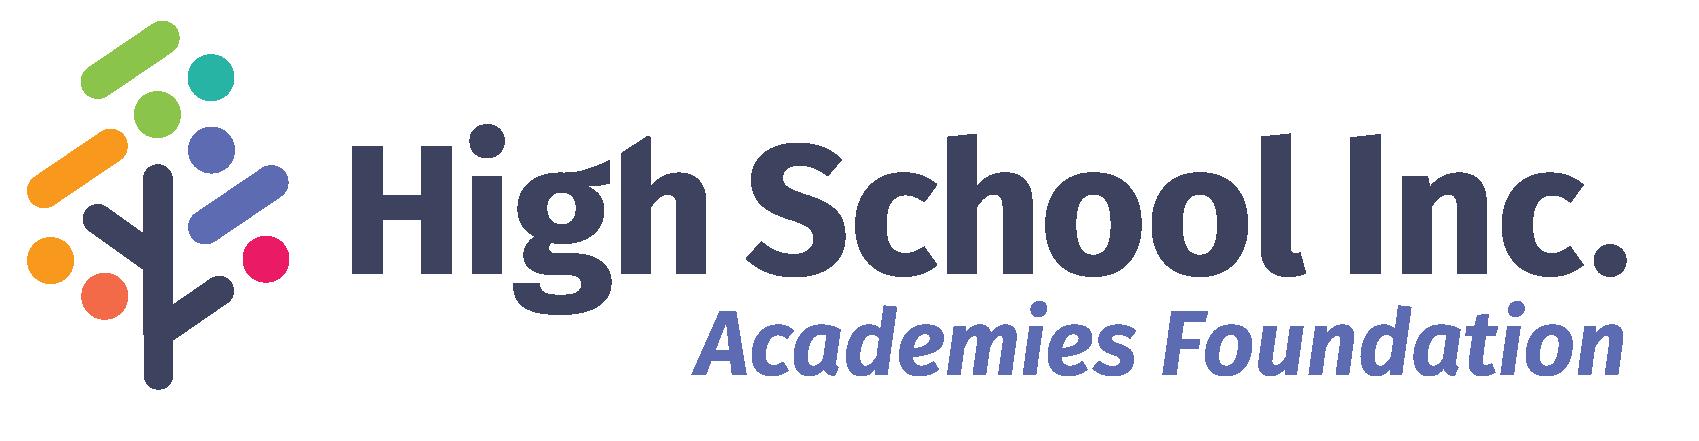 High School Inc. Academies Foundation